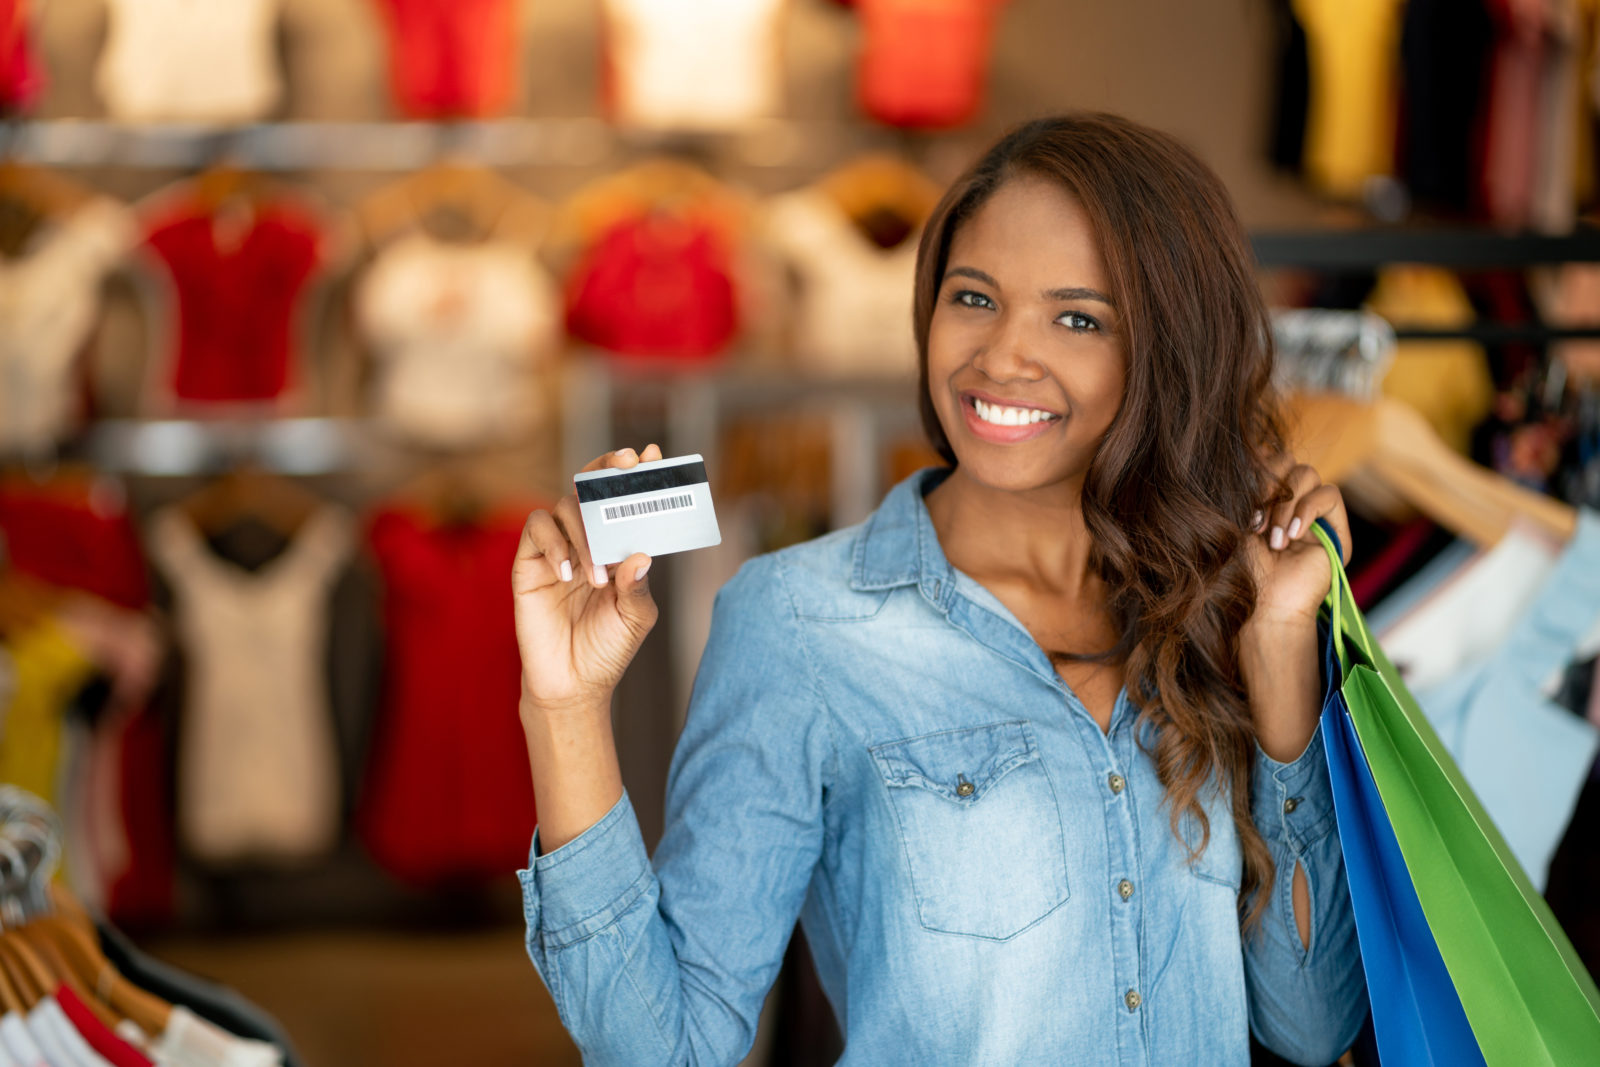 Eastern Savings Bank Debit Mastercard